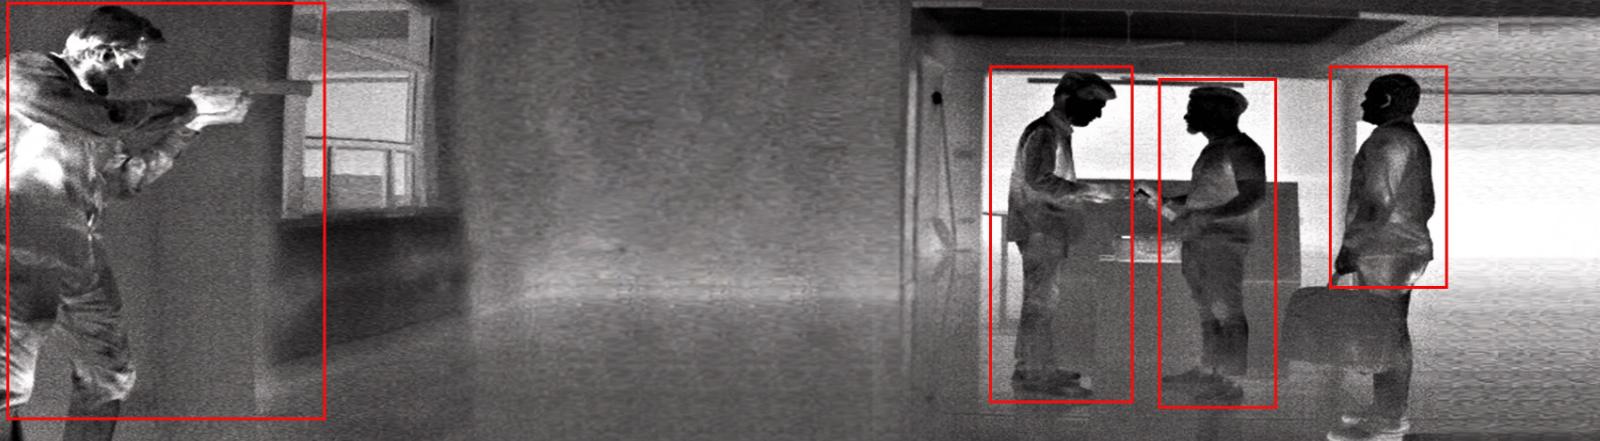 Night Vision Security Camera Footage